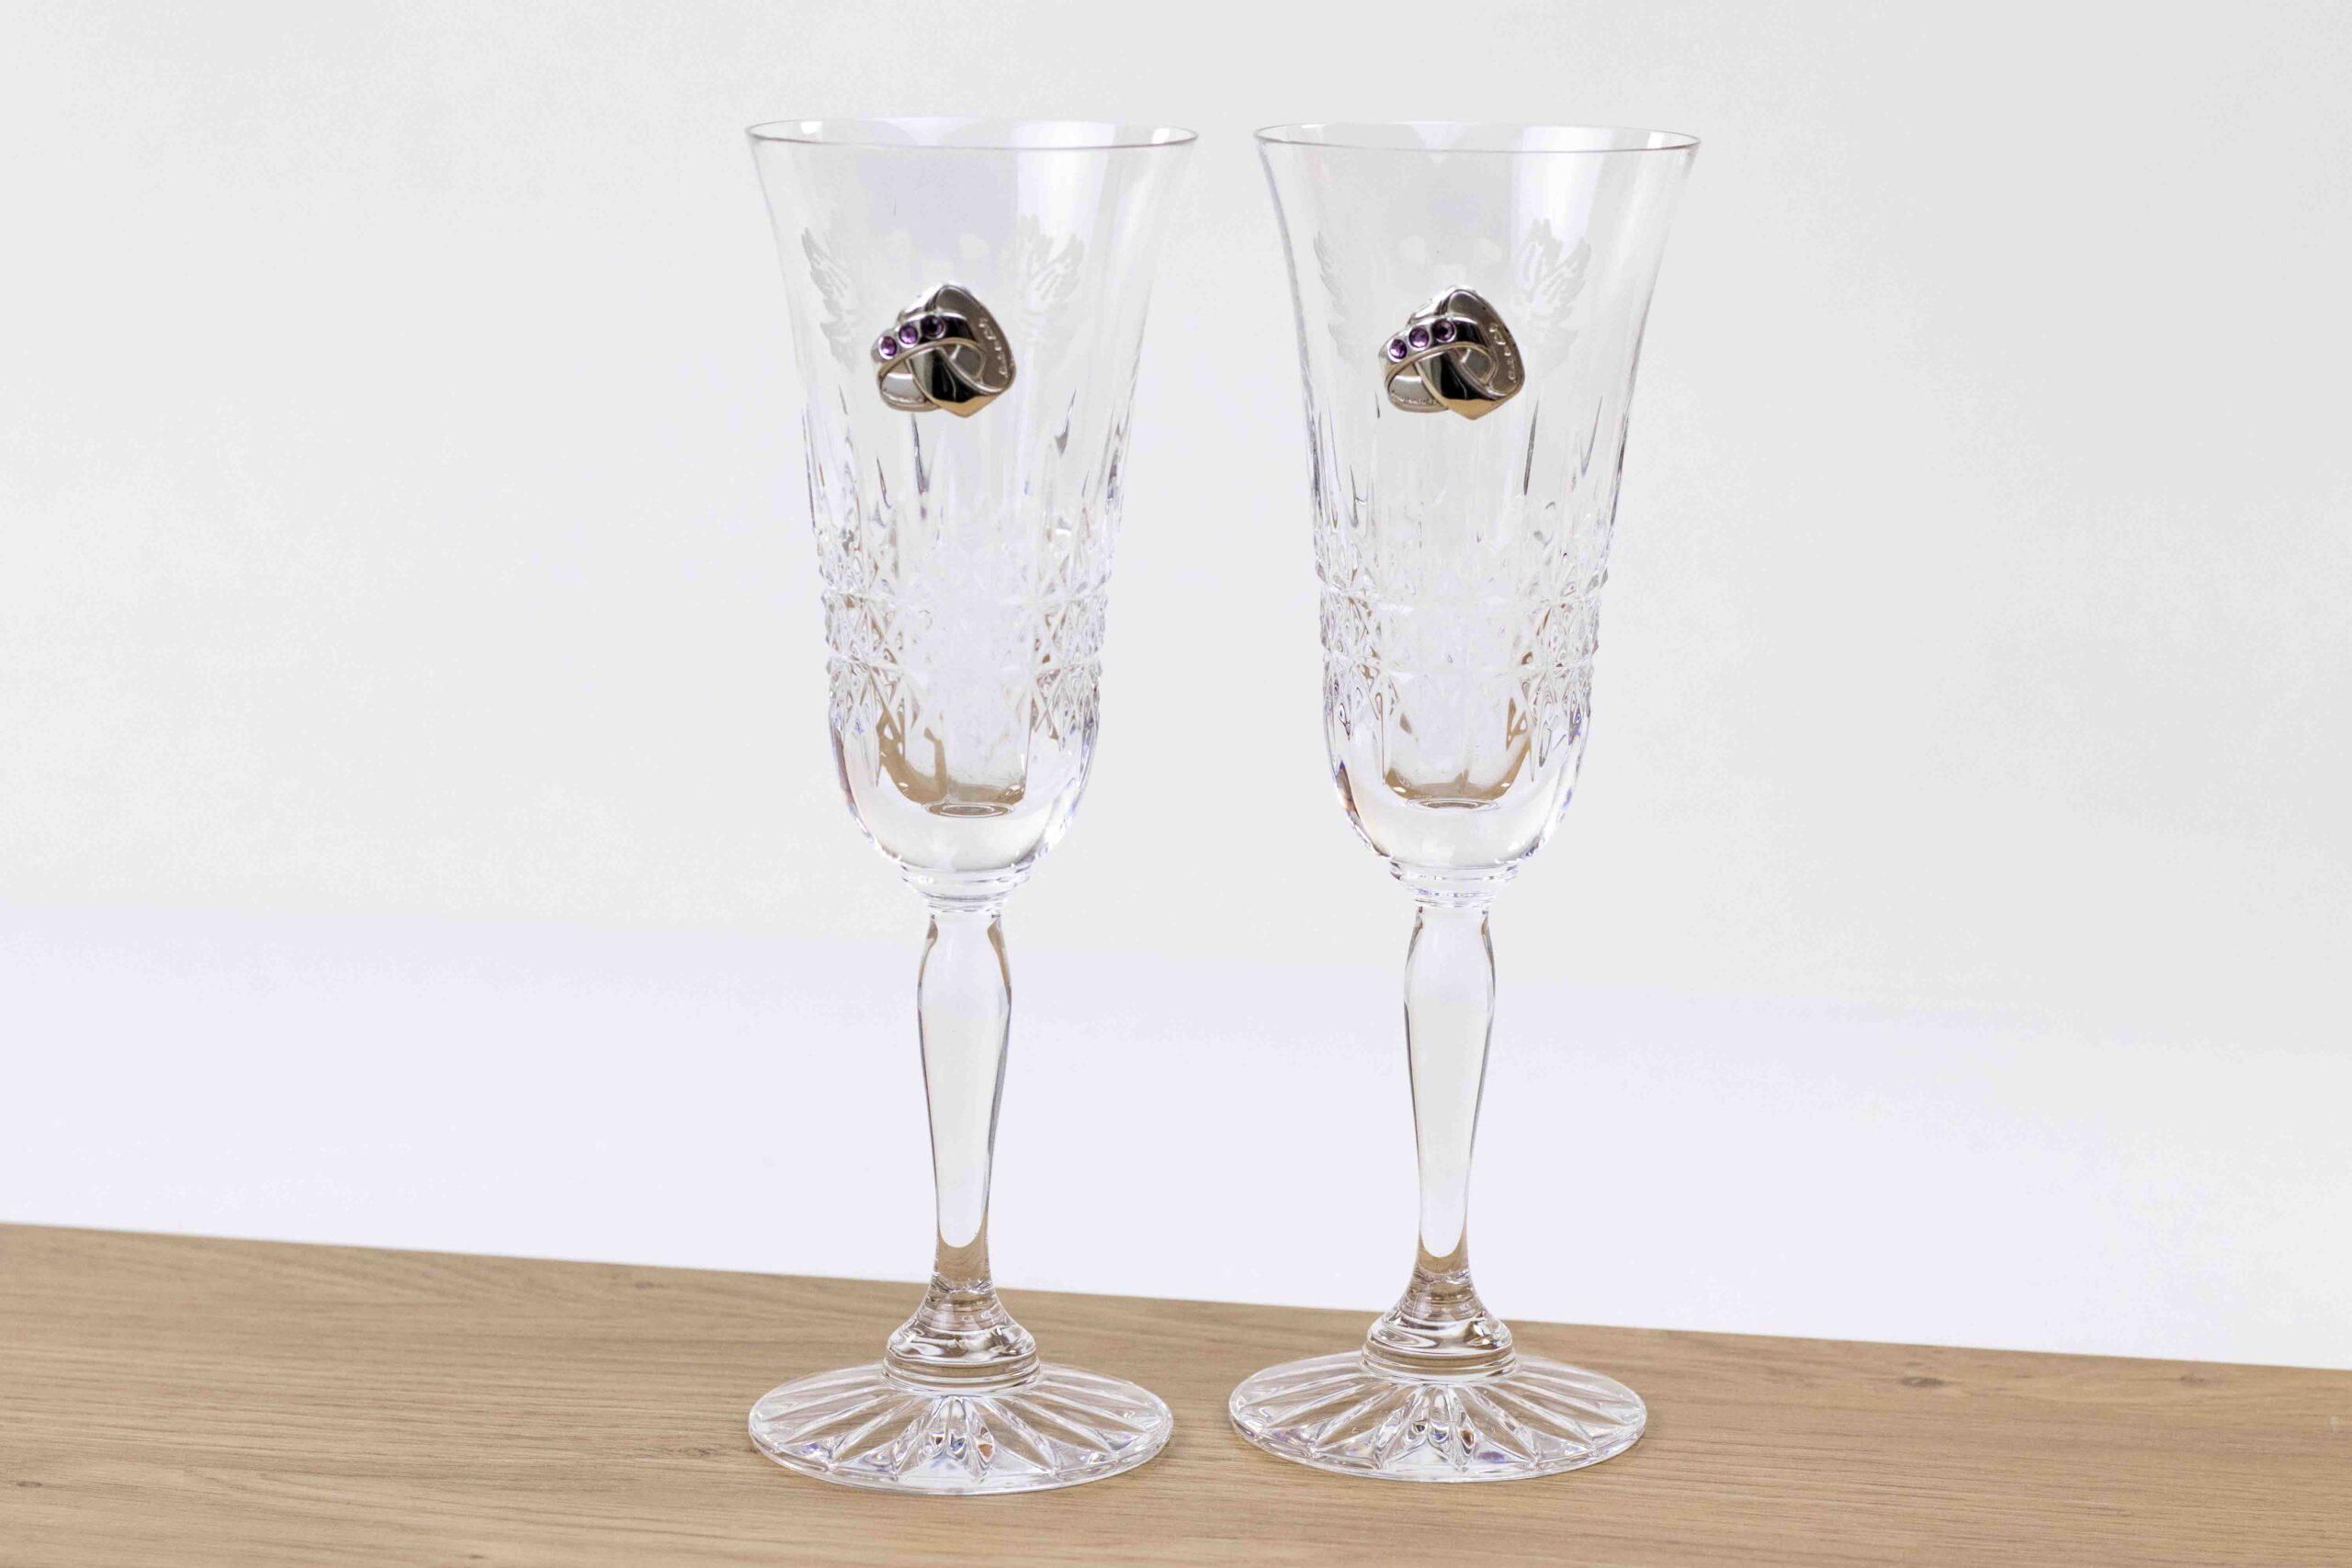 Trouwcadeau-champagneglas-met-zilveren-trouringen-en-stenen-paars--scaled.jpg